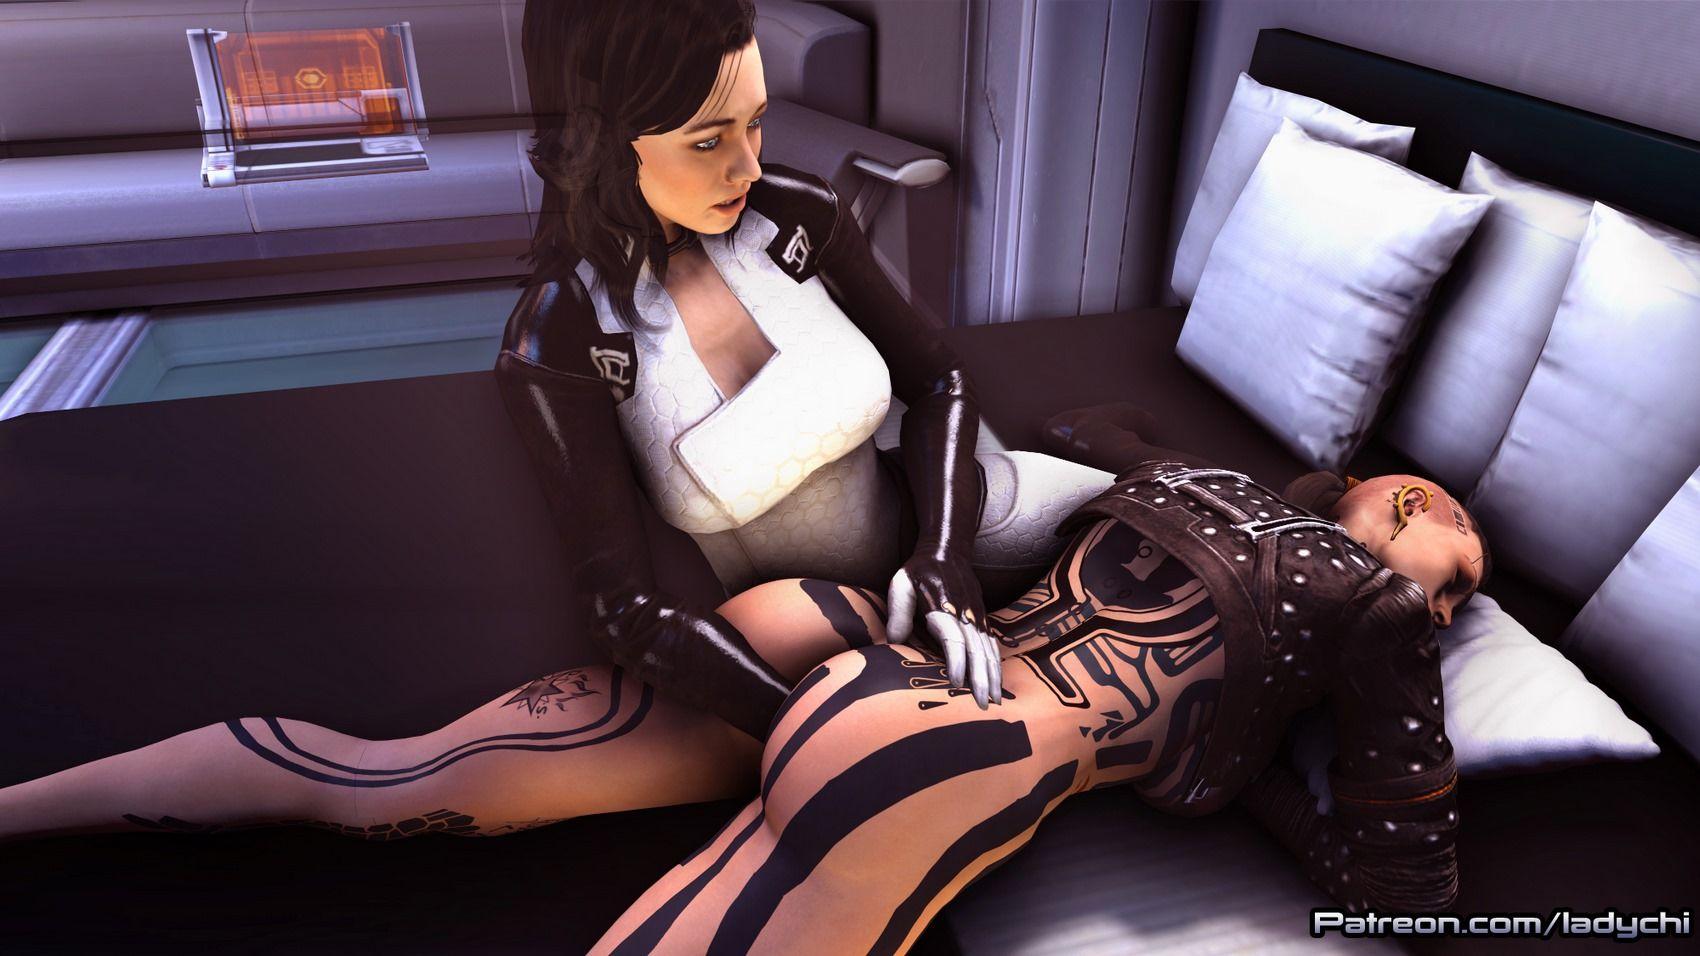 Jacks_Dream_Ladychi_(Mass_Effect) comix_57893.jpg